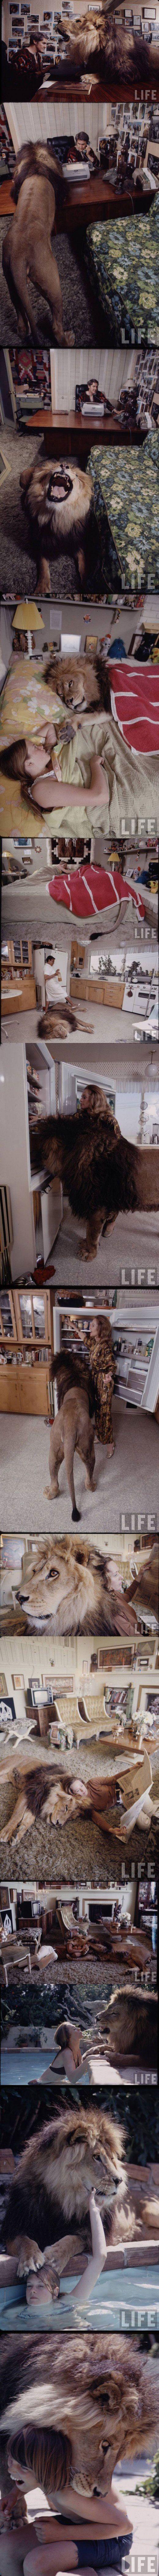 Living with a lion. I want himmmPets Lion, Shambala Preserves, Melanie Griffith, Life Magazines, Mojave Deserts, Tippi Hendren, Families, Wildlife Sanctuary, Animal